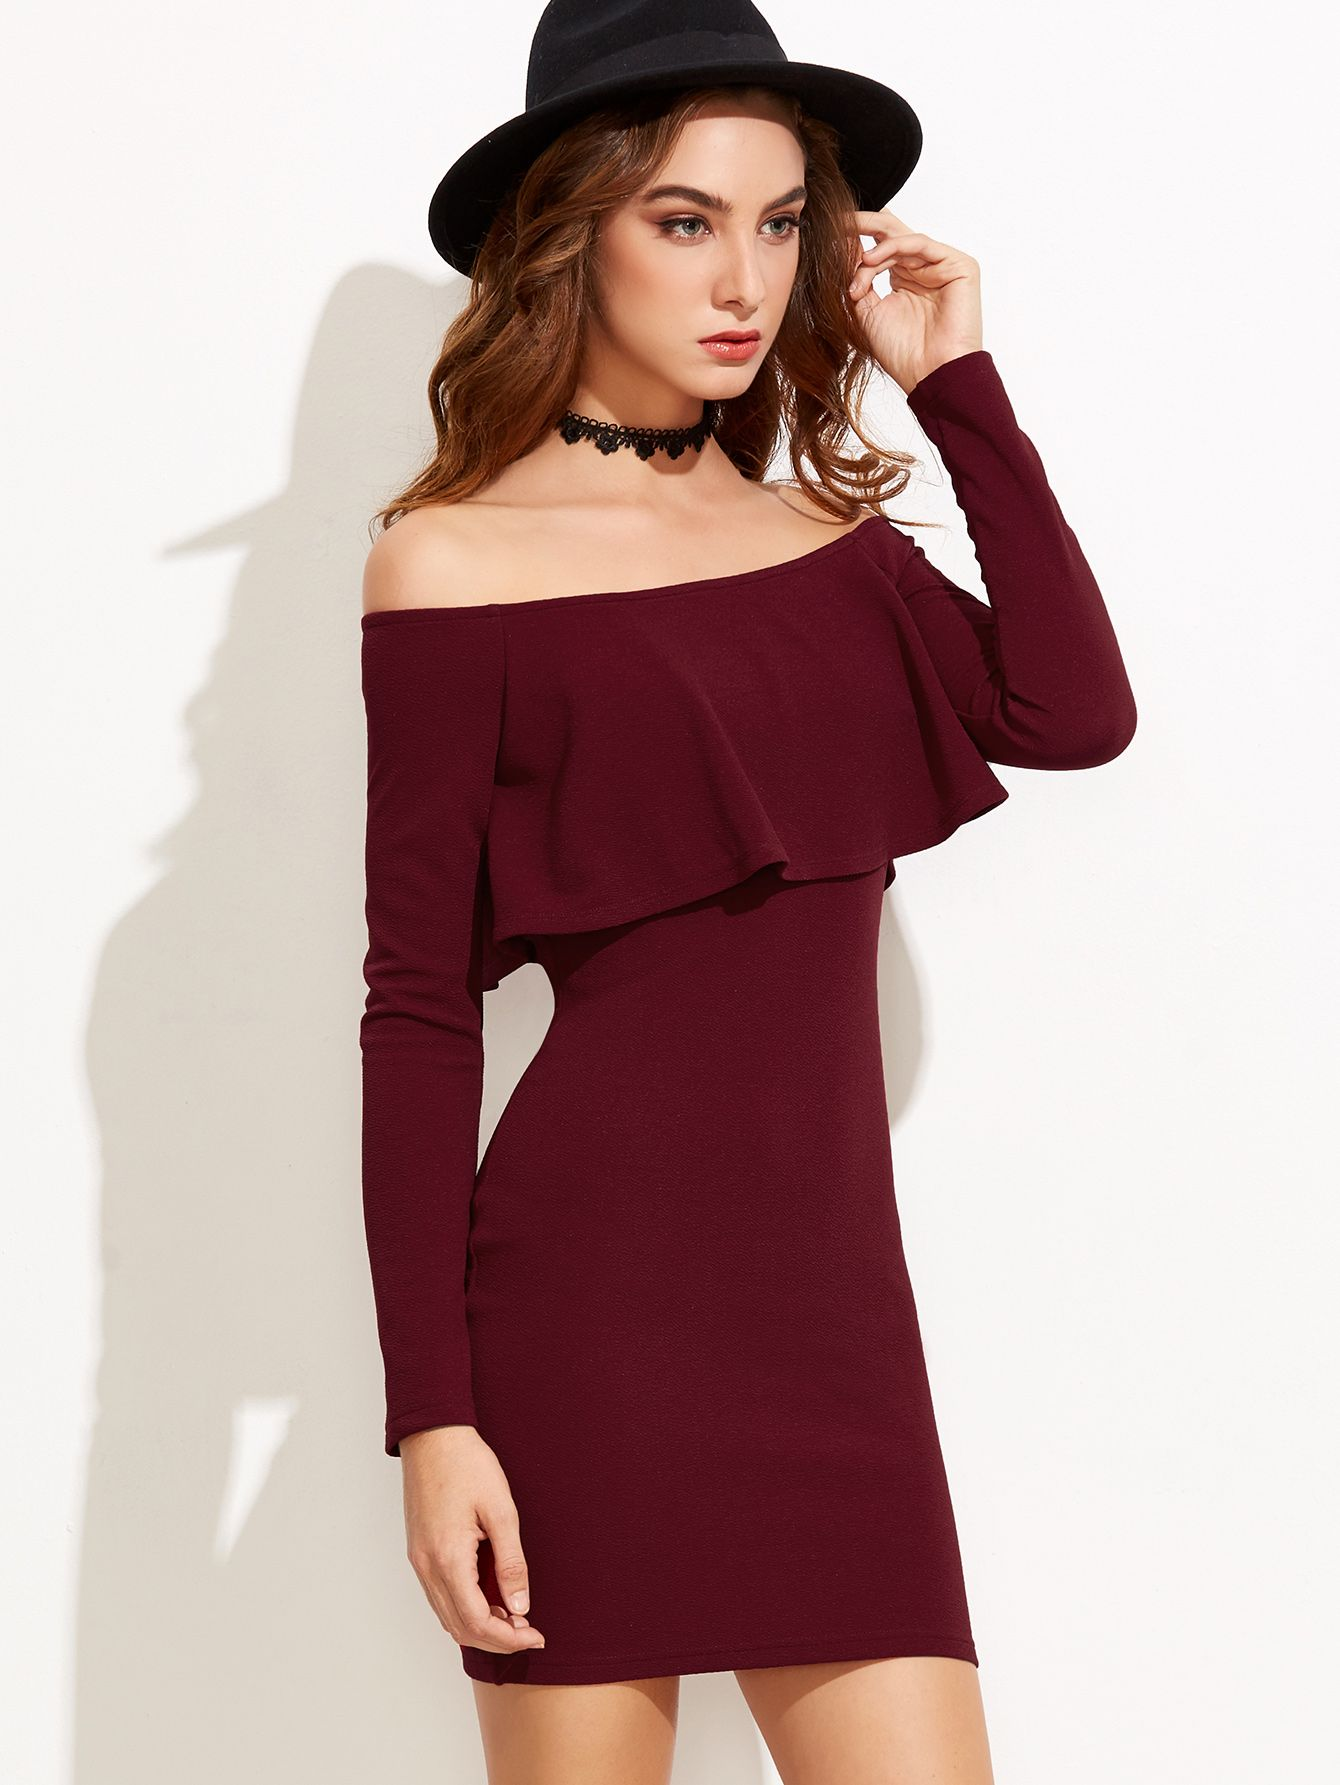 89c212740a Shop Burgundy Off The Shoulder Ruffle Bodycon Dress online. SheIn ...